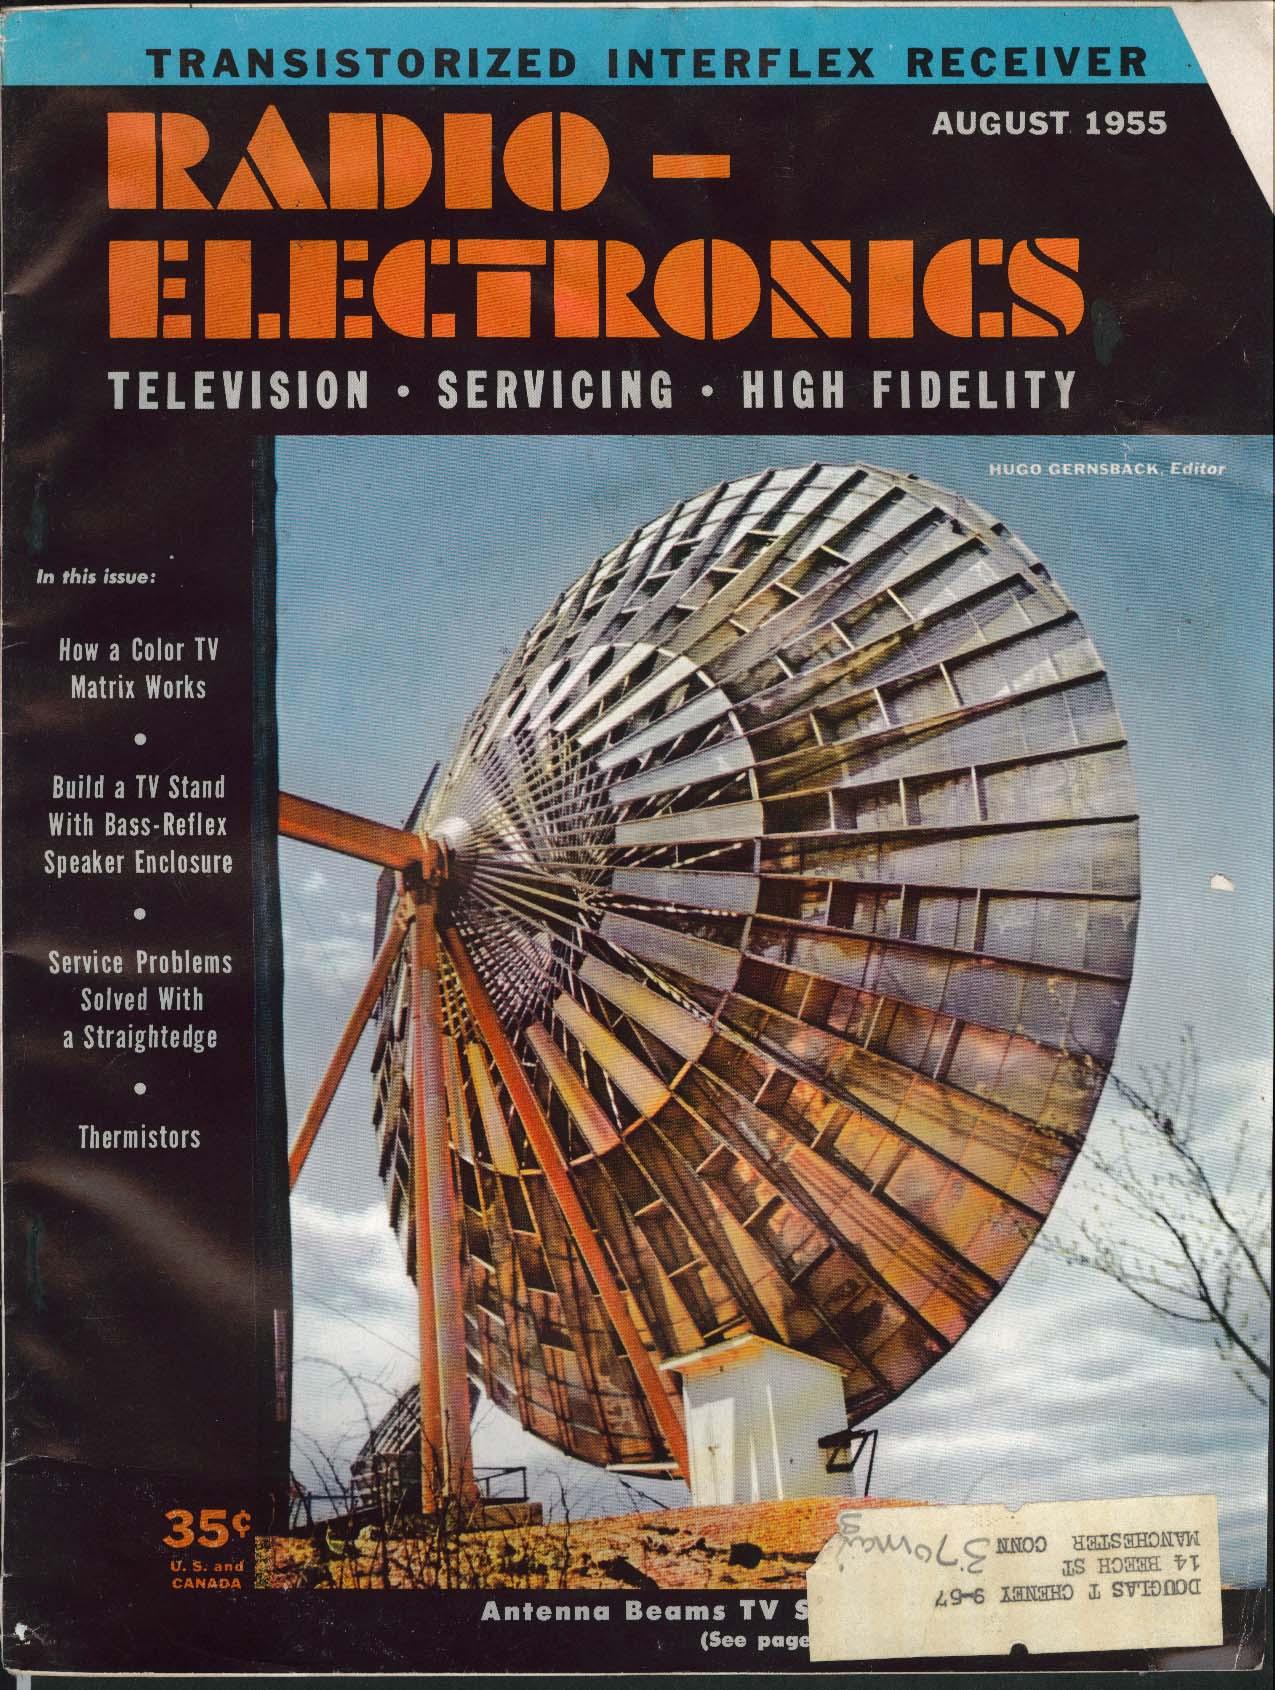 RADIO-ELECTRONICS Color TV Bass-Reflex Speaker Enclosure Thermistor ++ 8 1955